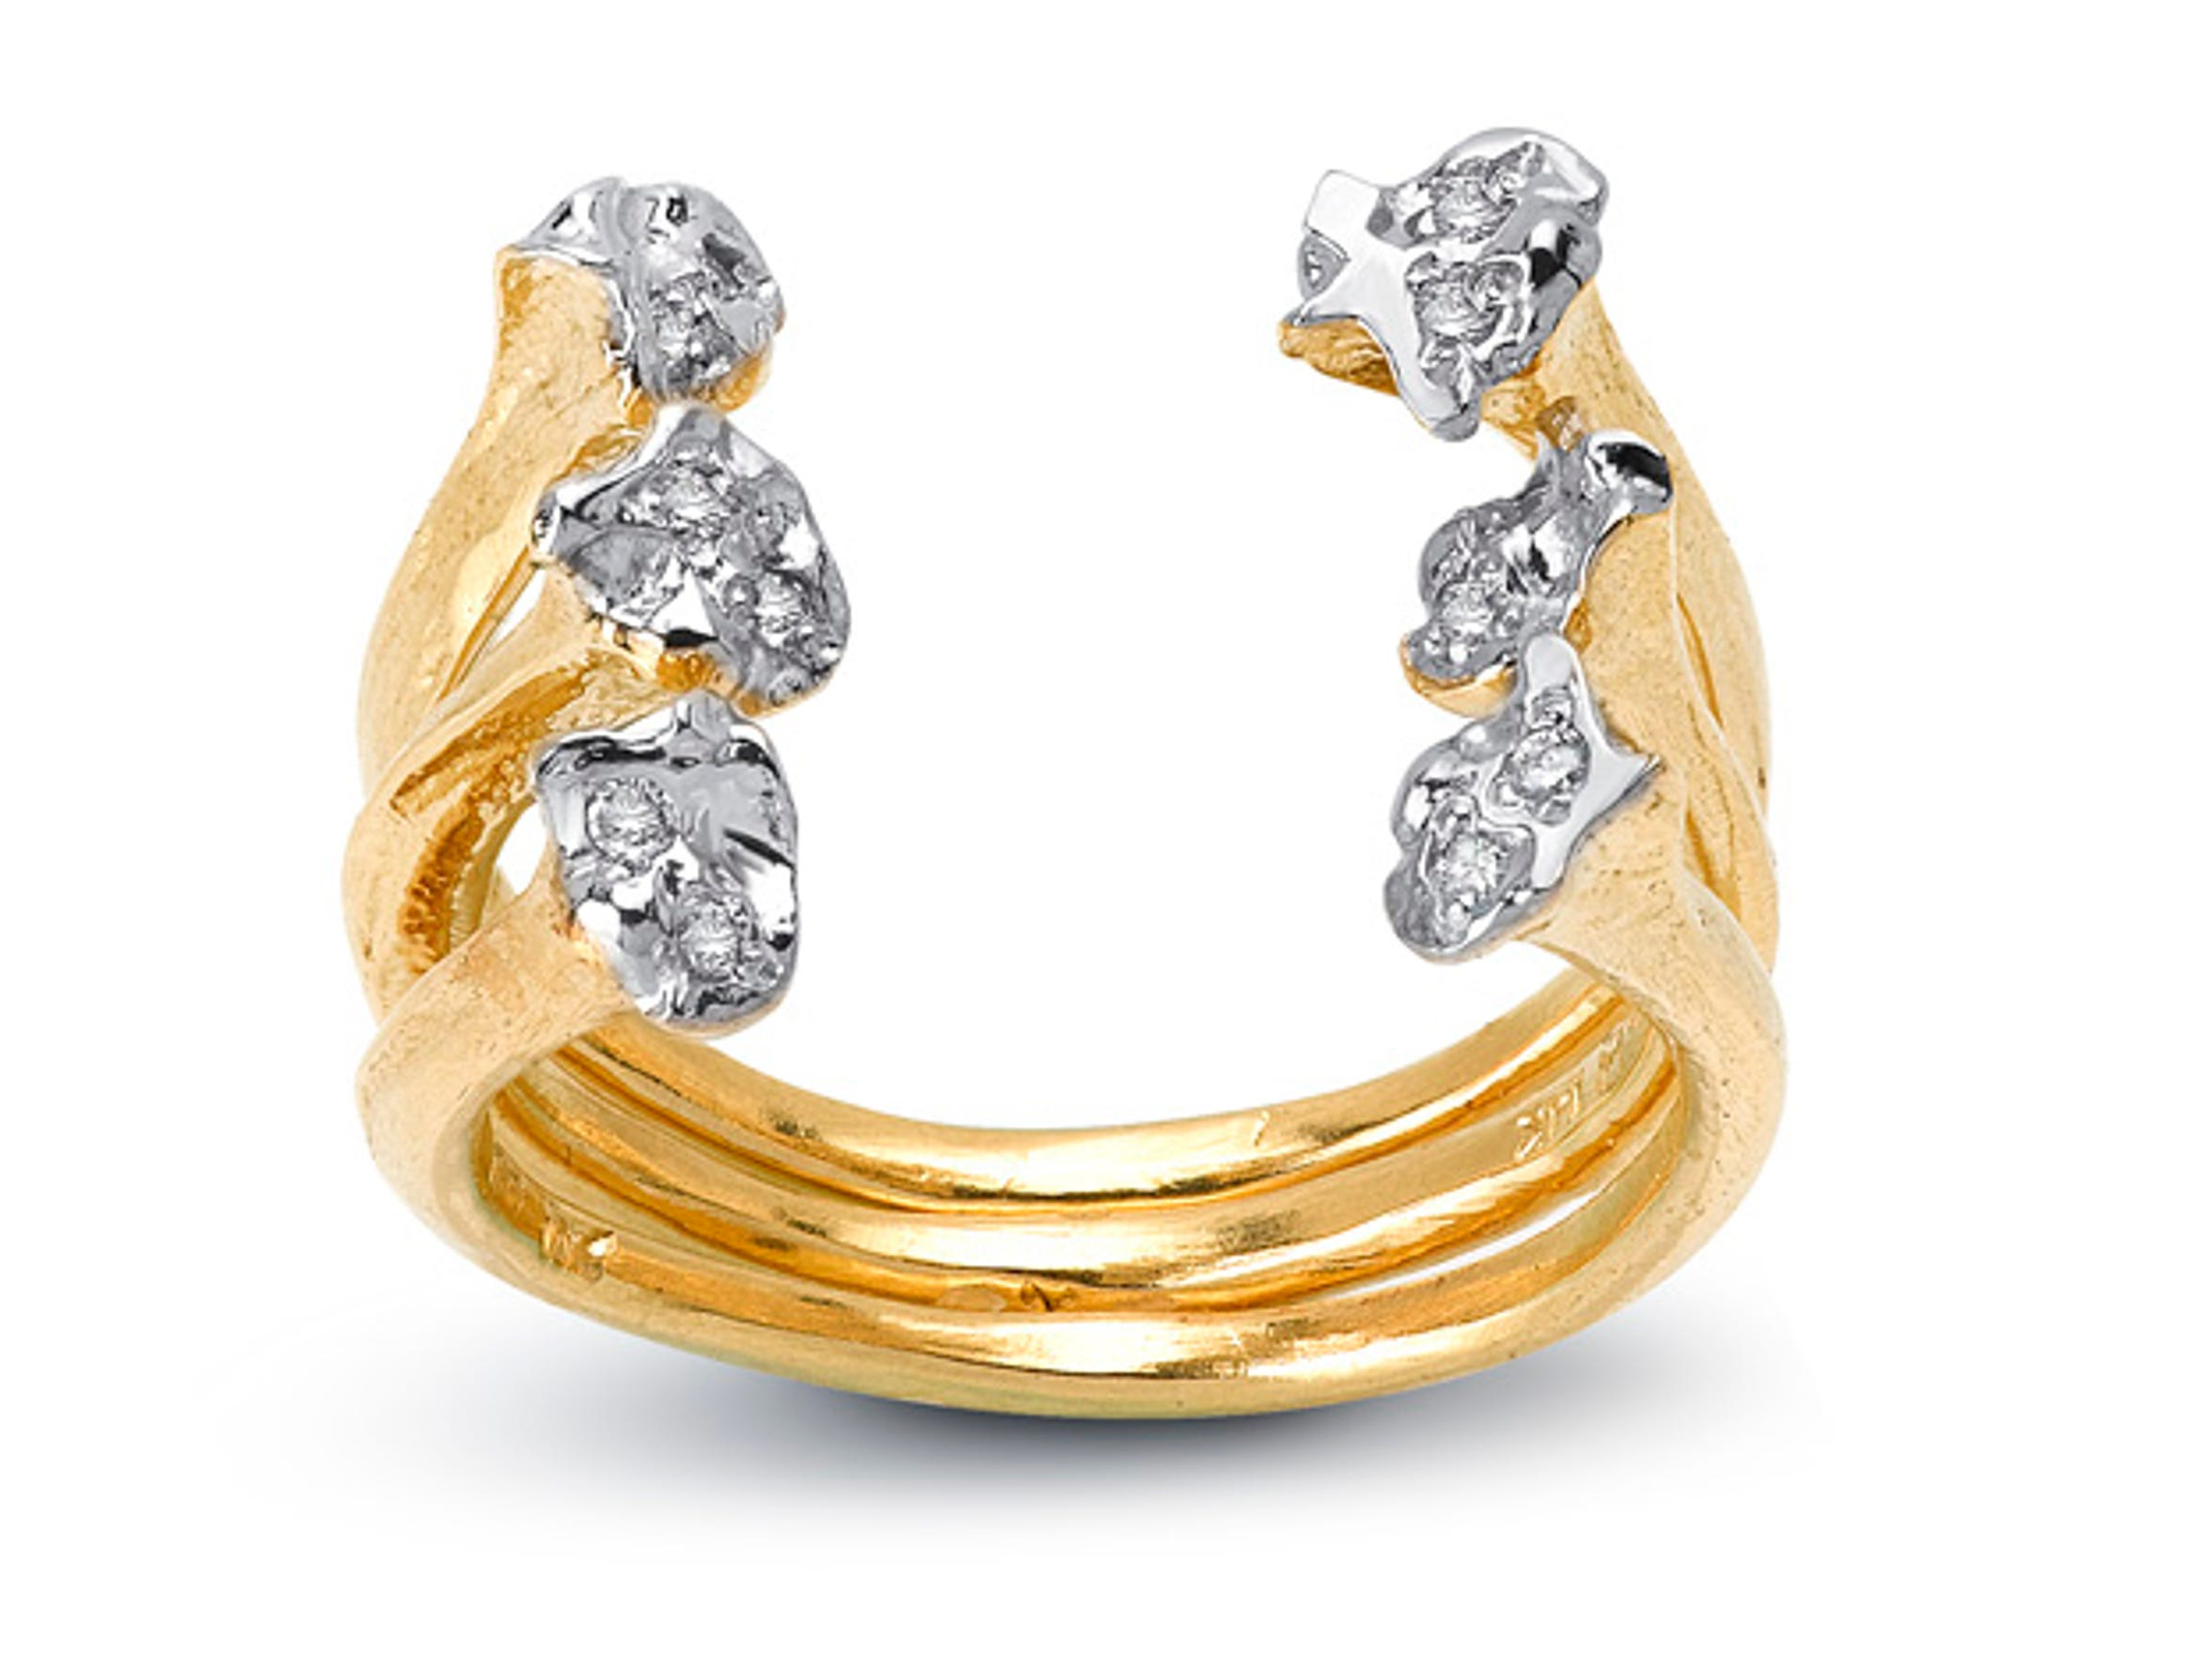 Elisabeth Bell Jewelry quail ring